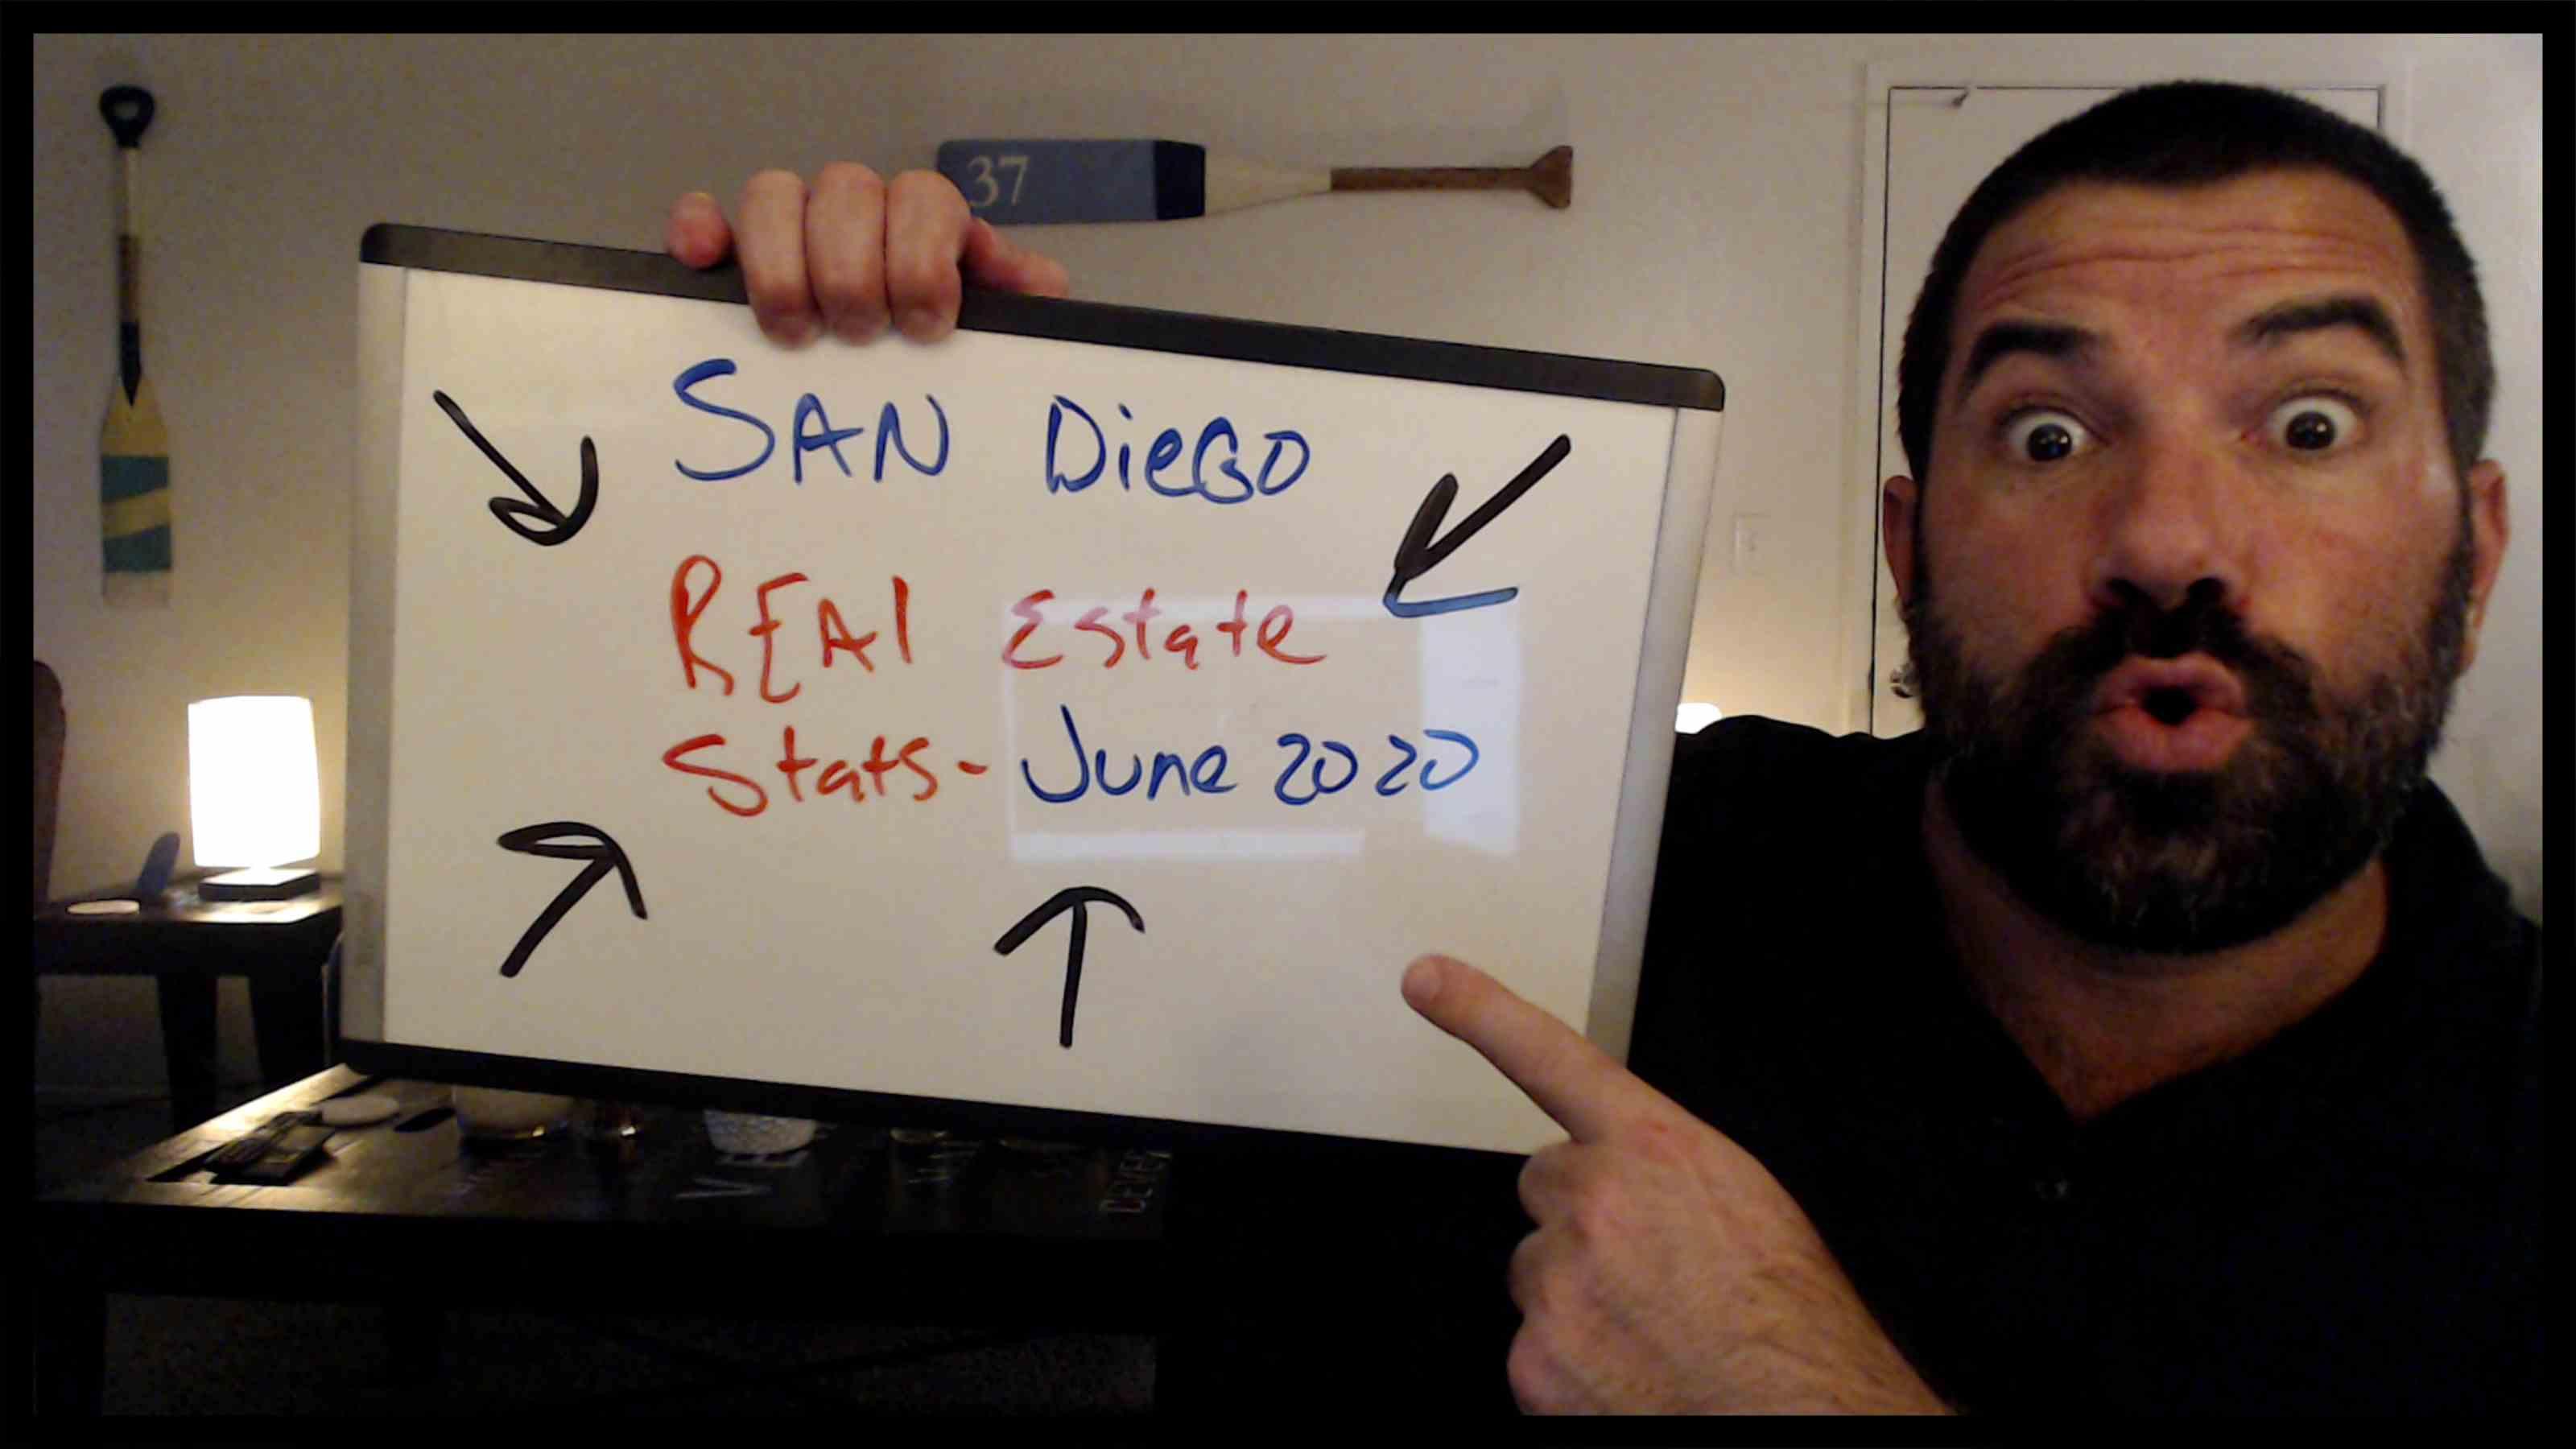 Released: San Diego Real Estate Market Statistics 2020 | 2021